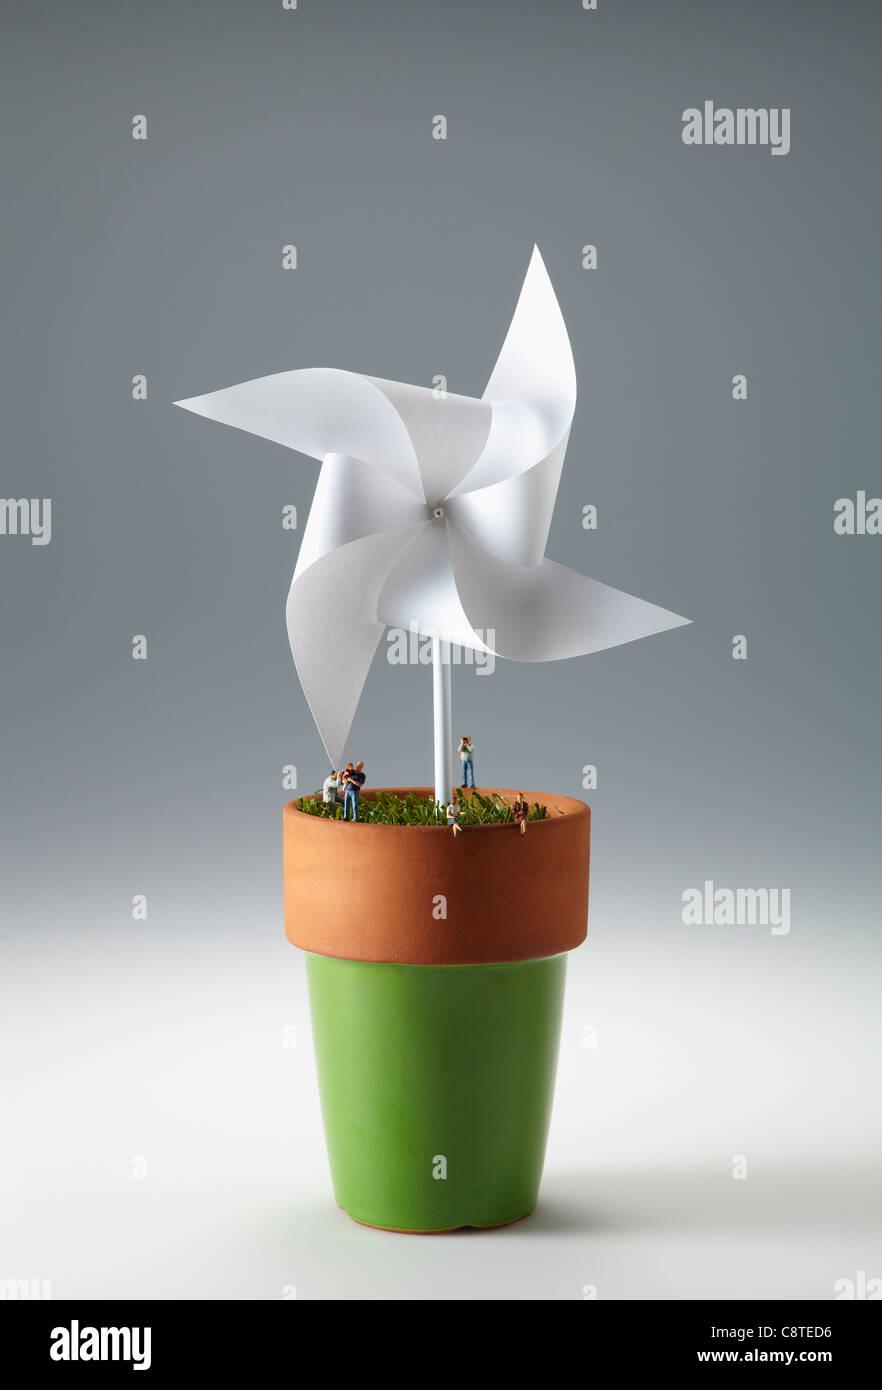 White Paper Windmill In Flowerpot Stock Photo 39876178 Alamy